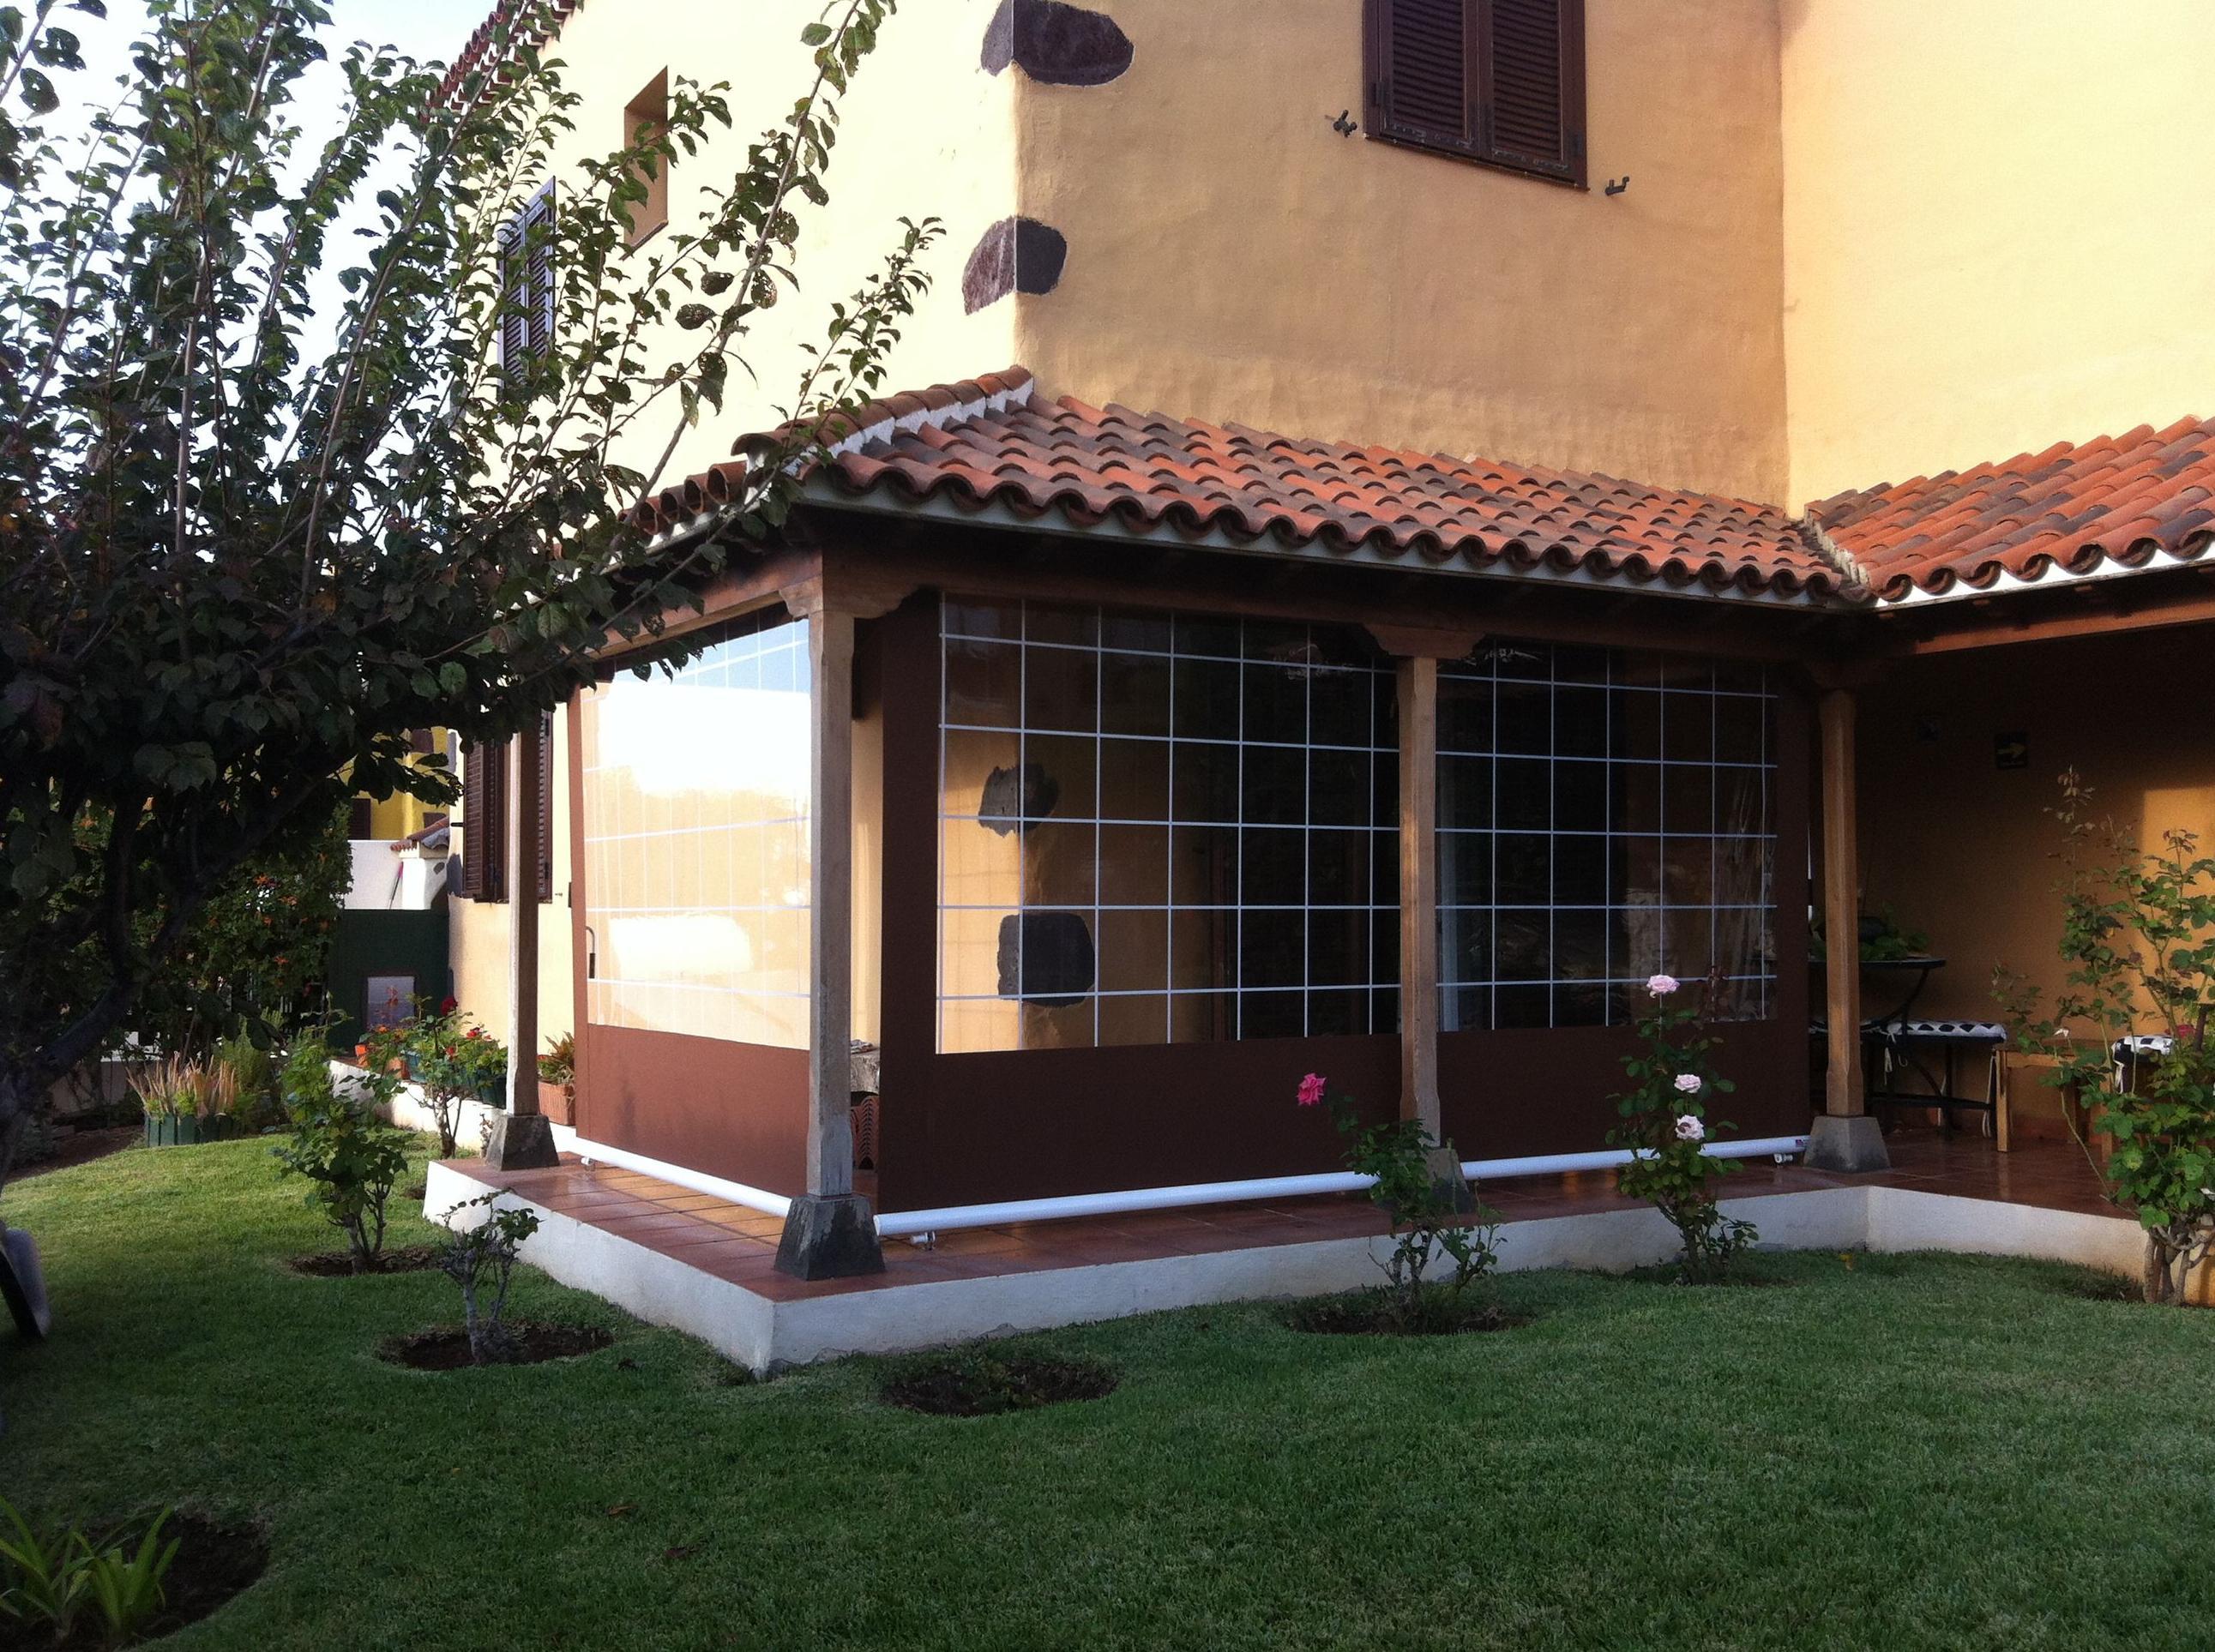 Toldos verticales precios simple toldos para exteriores for Precios de toldos para terrazas